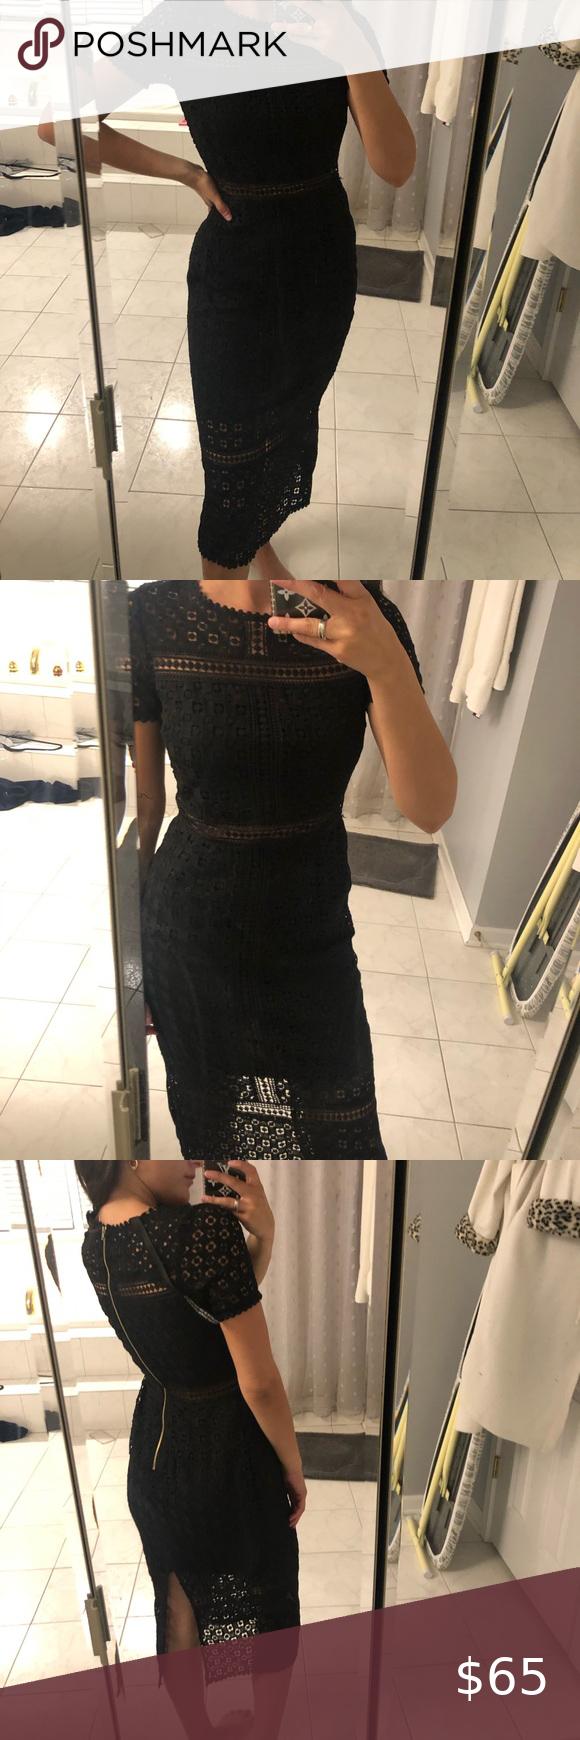 Pretty Little Thing Black Midi Lace Dress Black Lace Midi Dress Lace Midi Dress Lace Dress [ 1740 x 580 Pixel ]